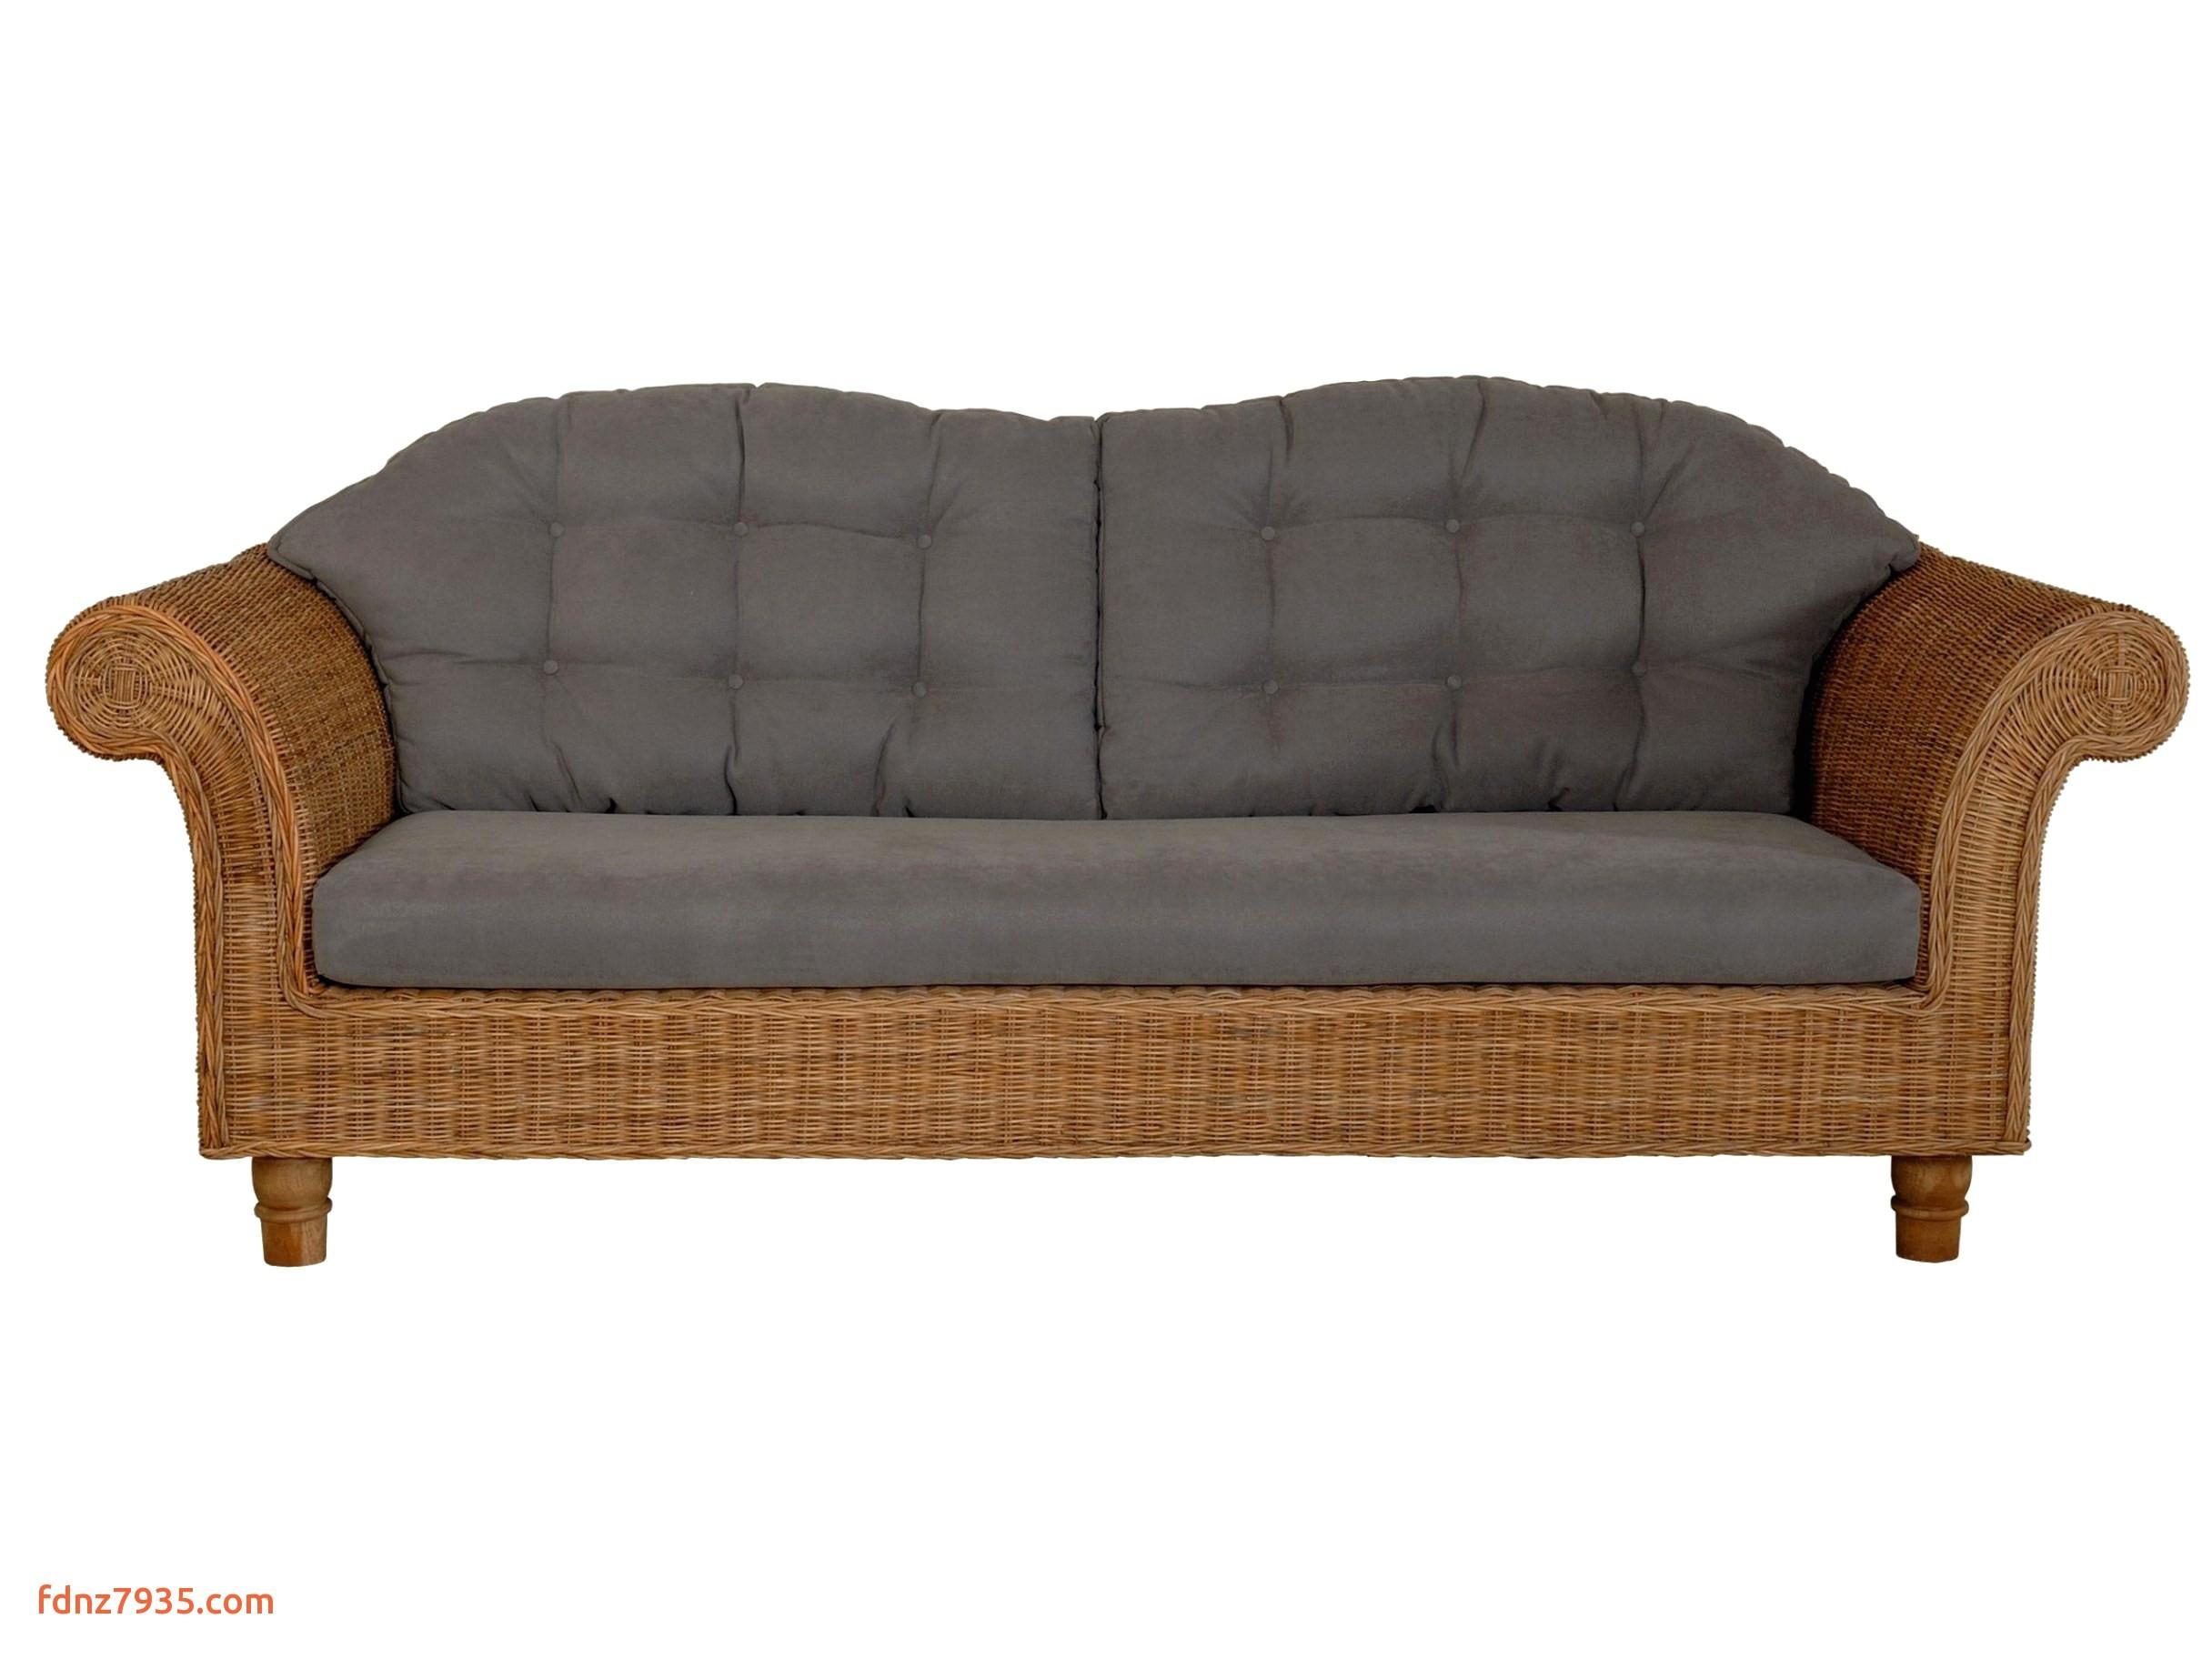 Boscov S Leather sofas King Size Sleeper sofa Fresh sofa Design